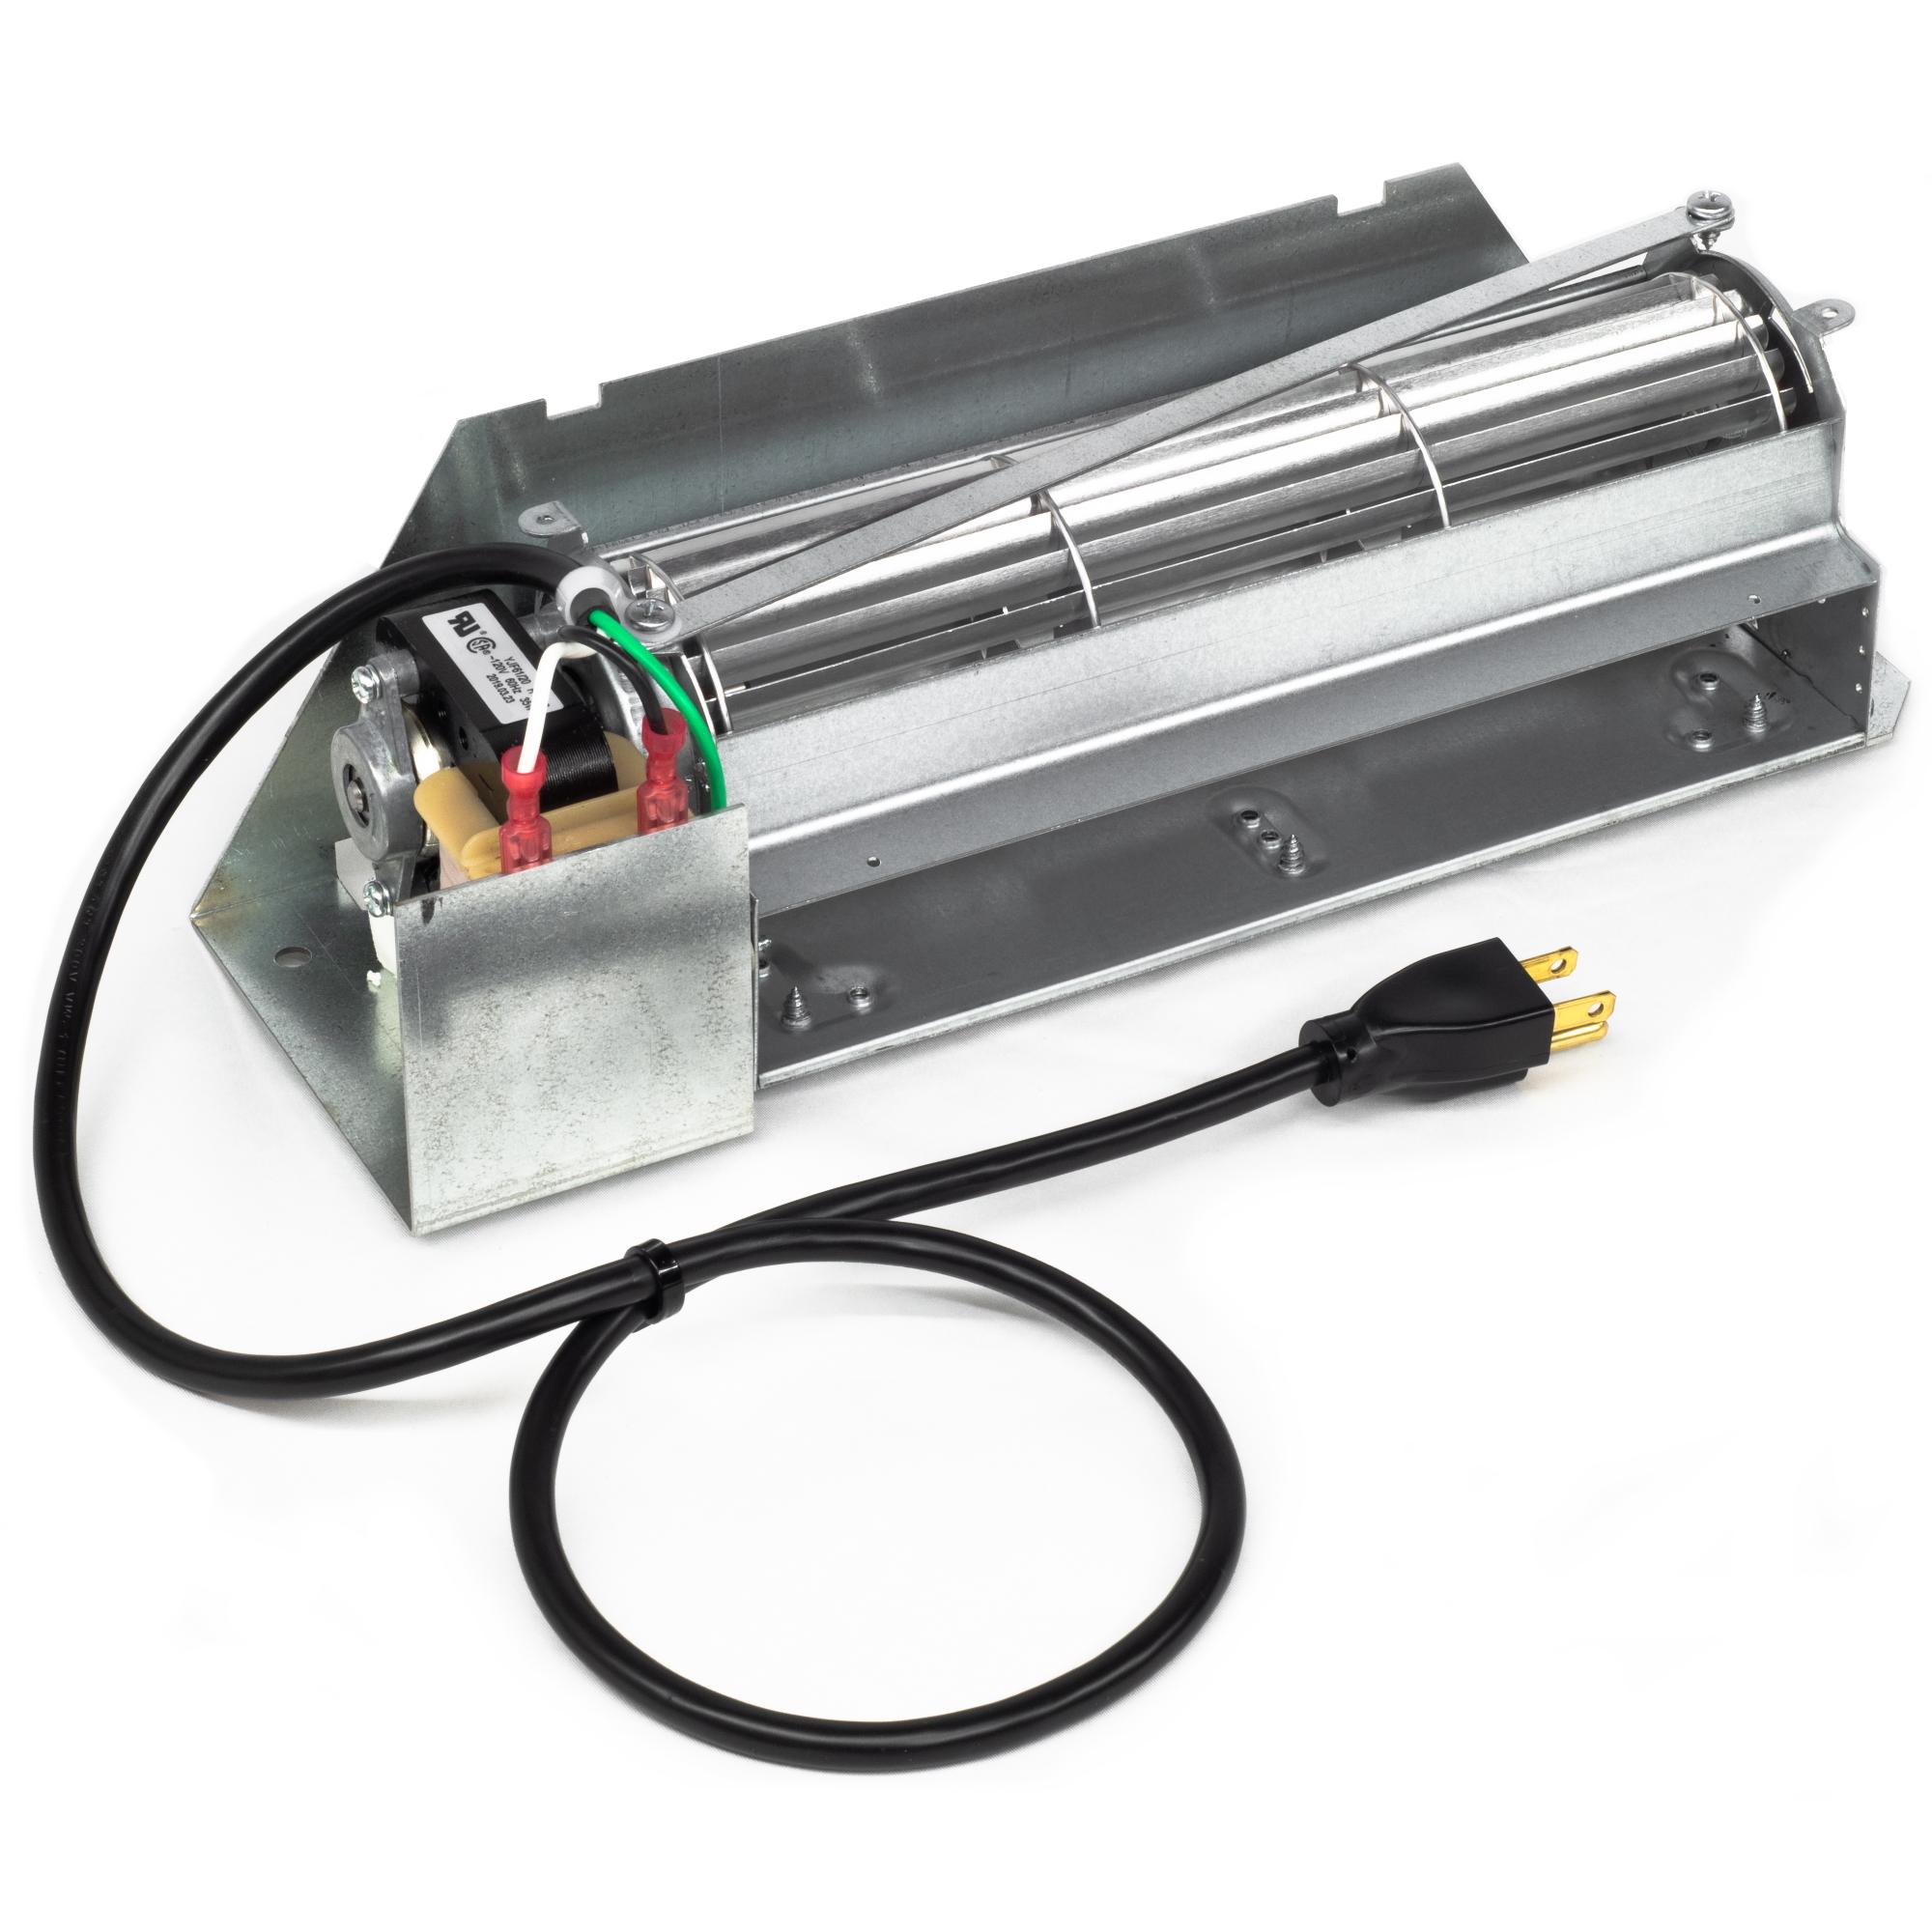 FBK-100 Blower Fan Conversion Kit for Astria, Lennox & Superior Fireplaces